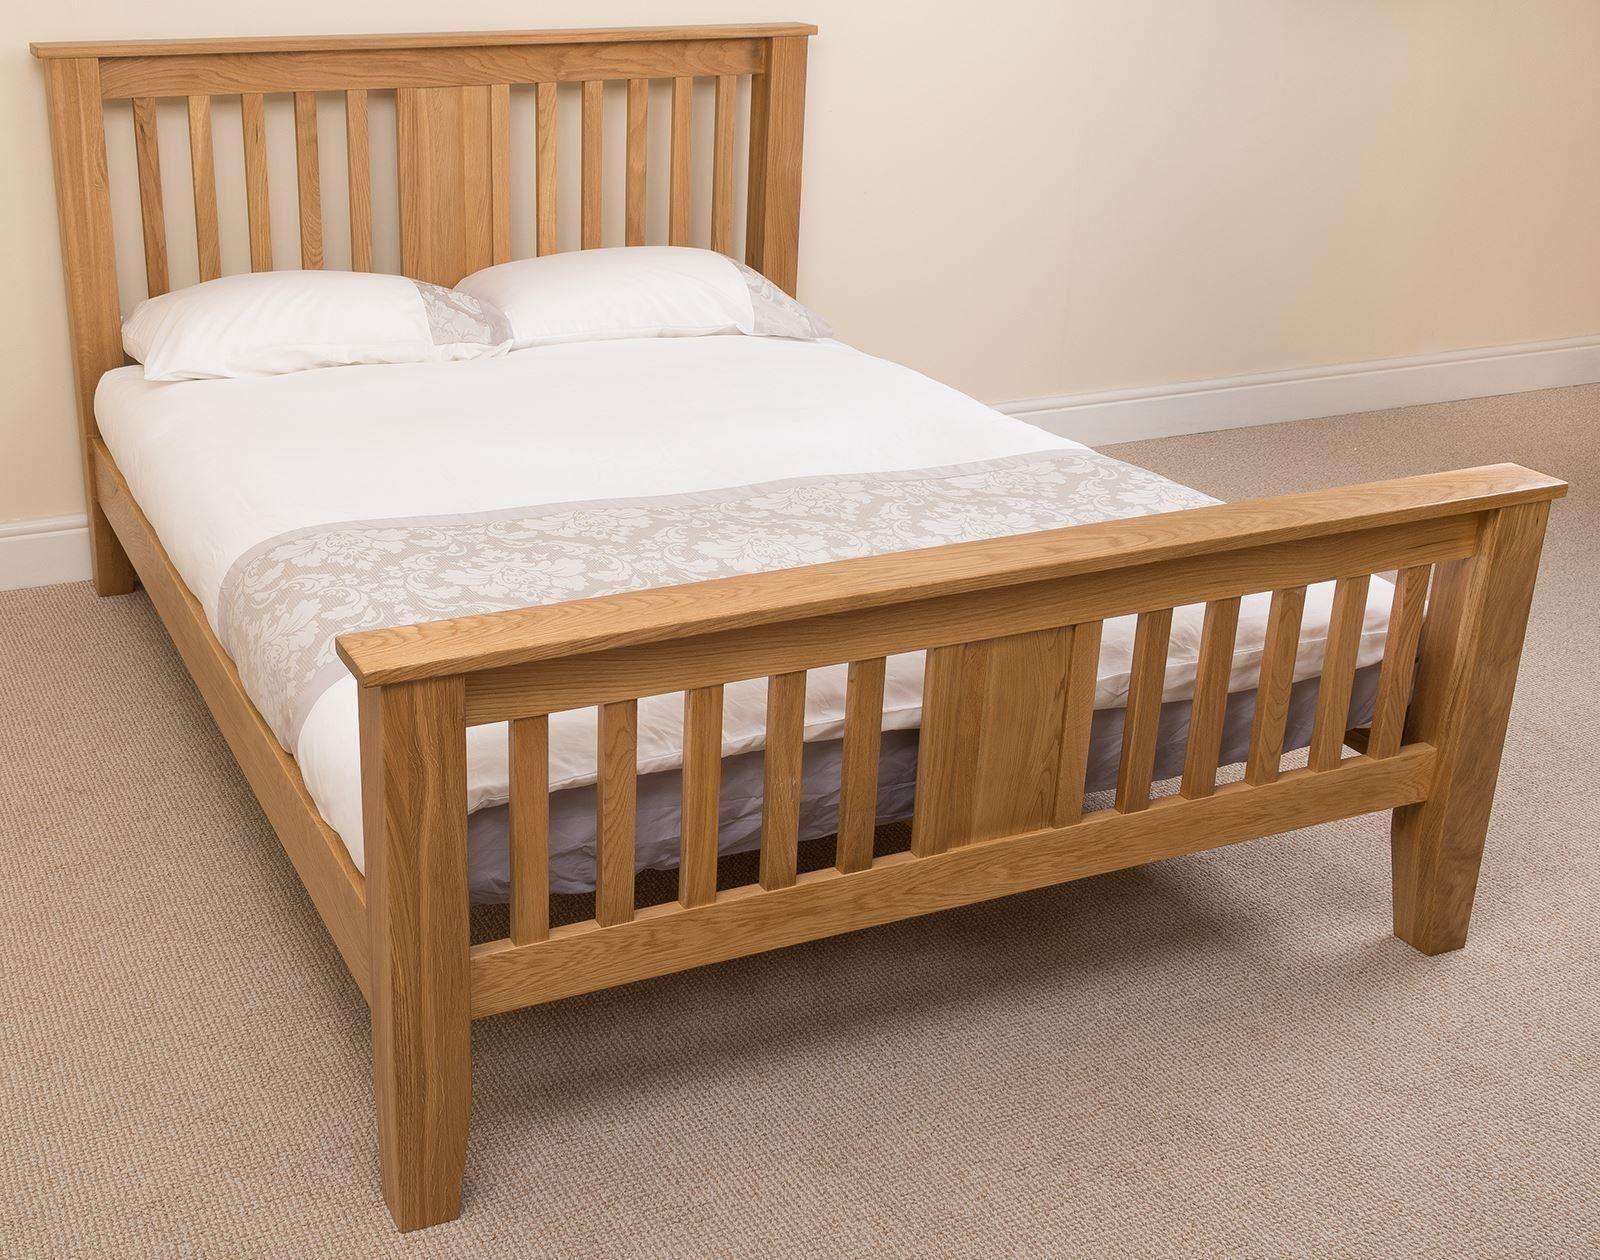 Boston Solid Oak 4ft6 Bed And Mattress Sets Modern